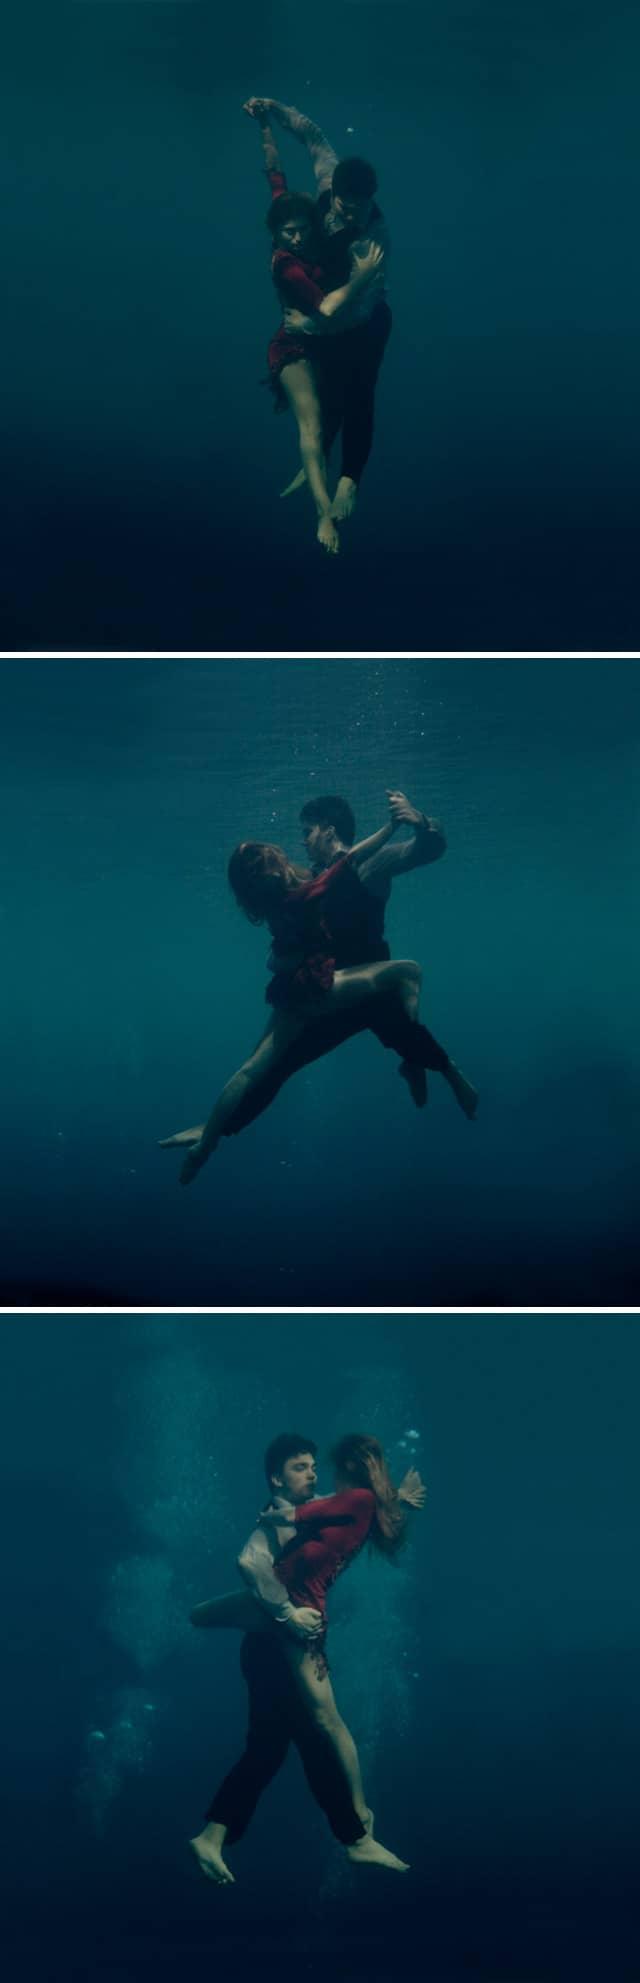 Fotógrafa retrata casal apaixonado dançando Tango debaixo d'água 2